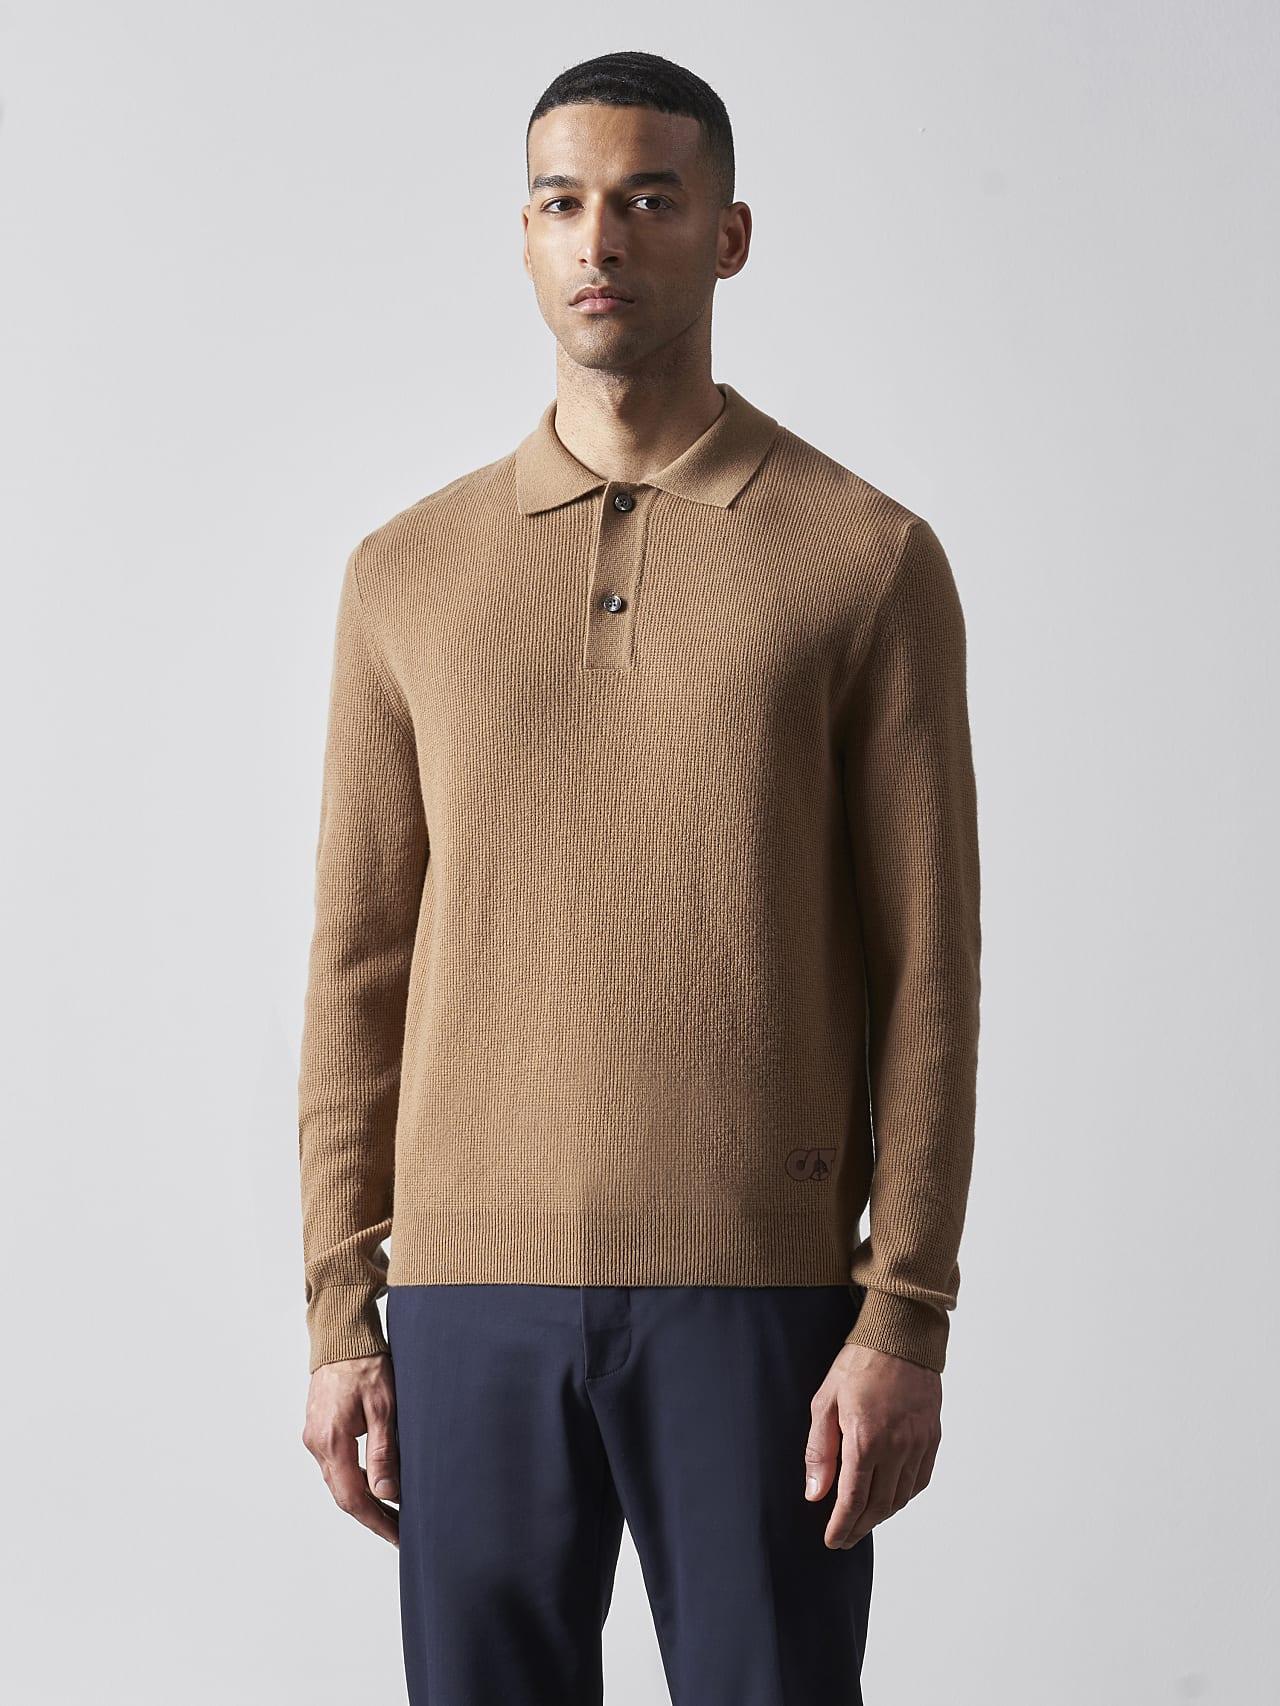 FORCE V1.Y5.02 Cashmere-Blend Knit Polo Longsleeve gold Model shot Alpha Tauri